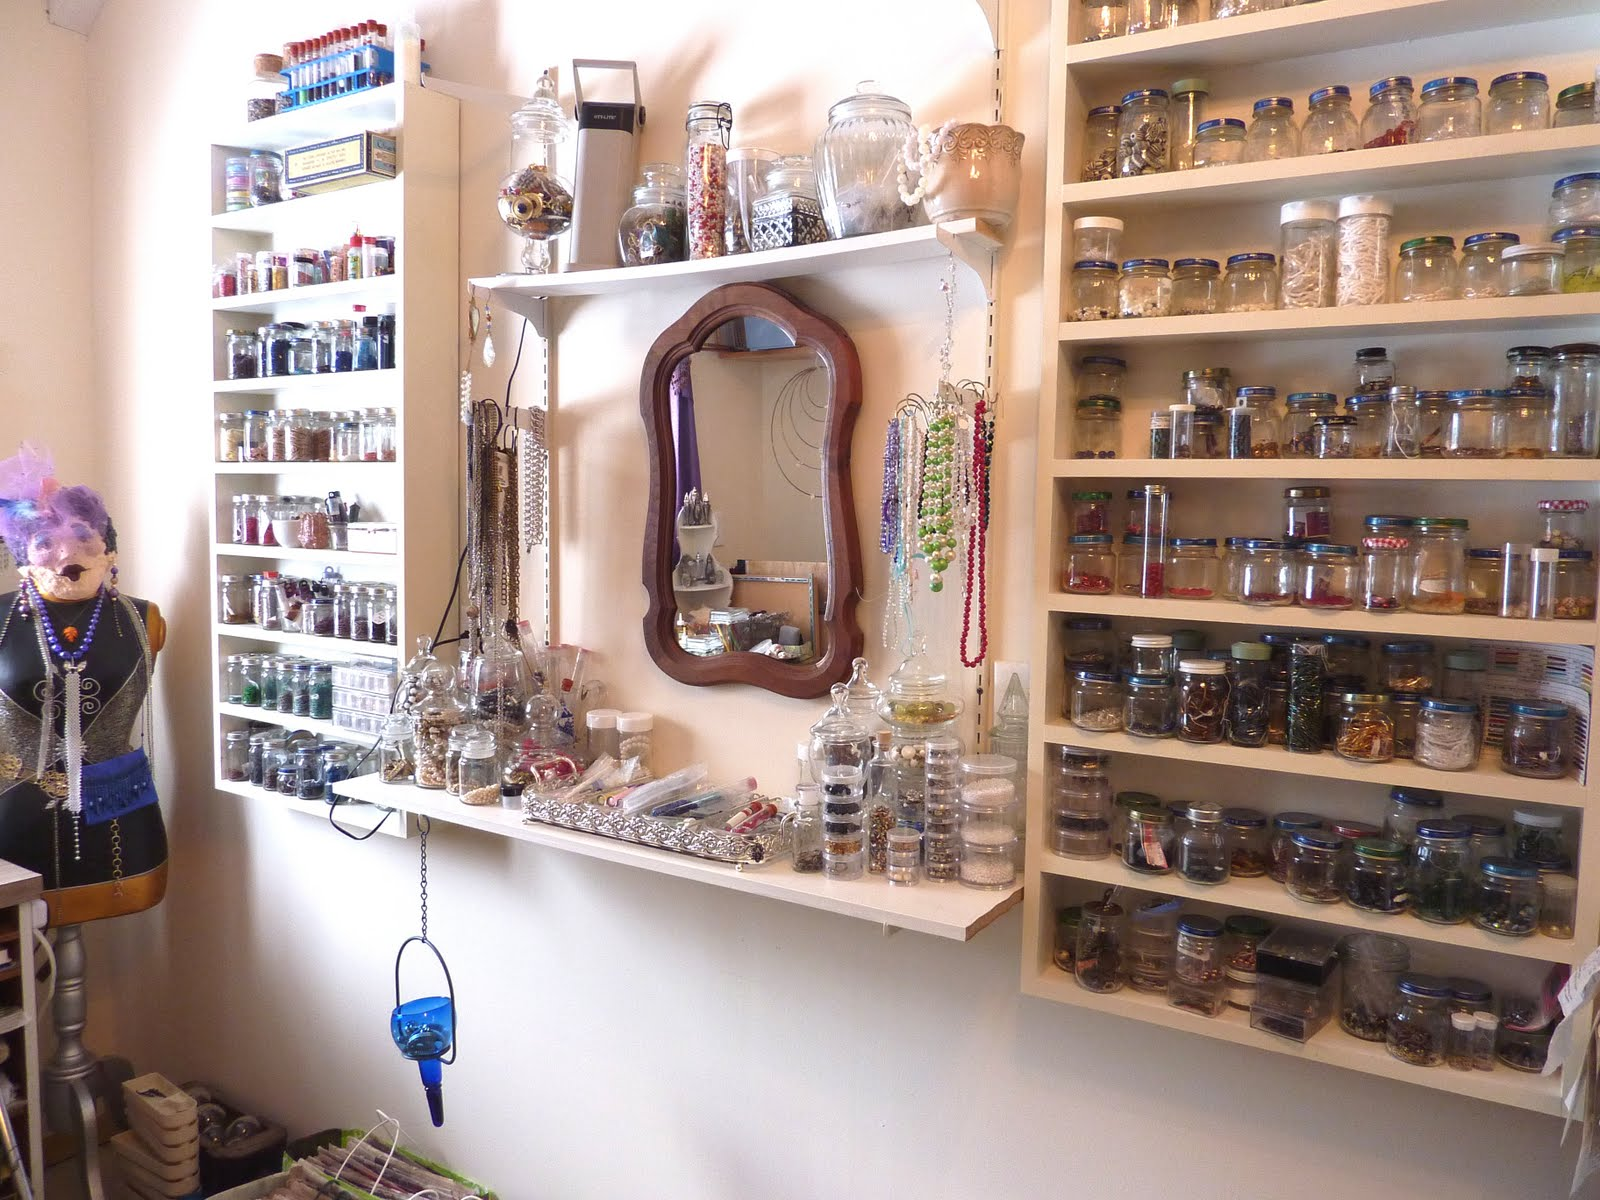 ceoriginal art and craft studio organizing and storage solutions